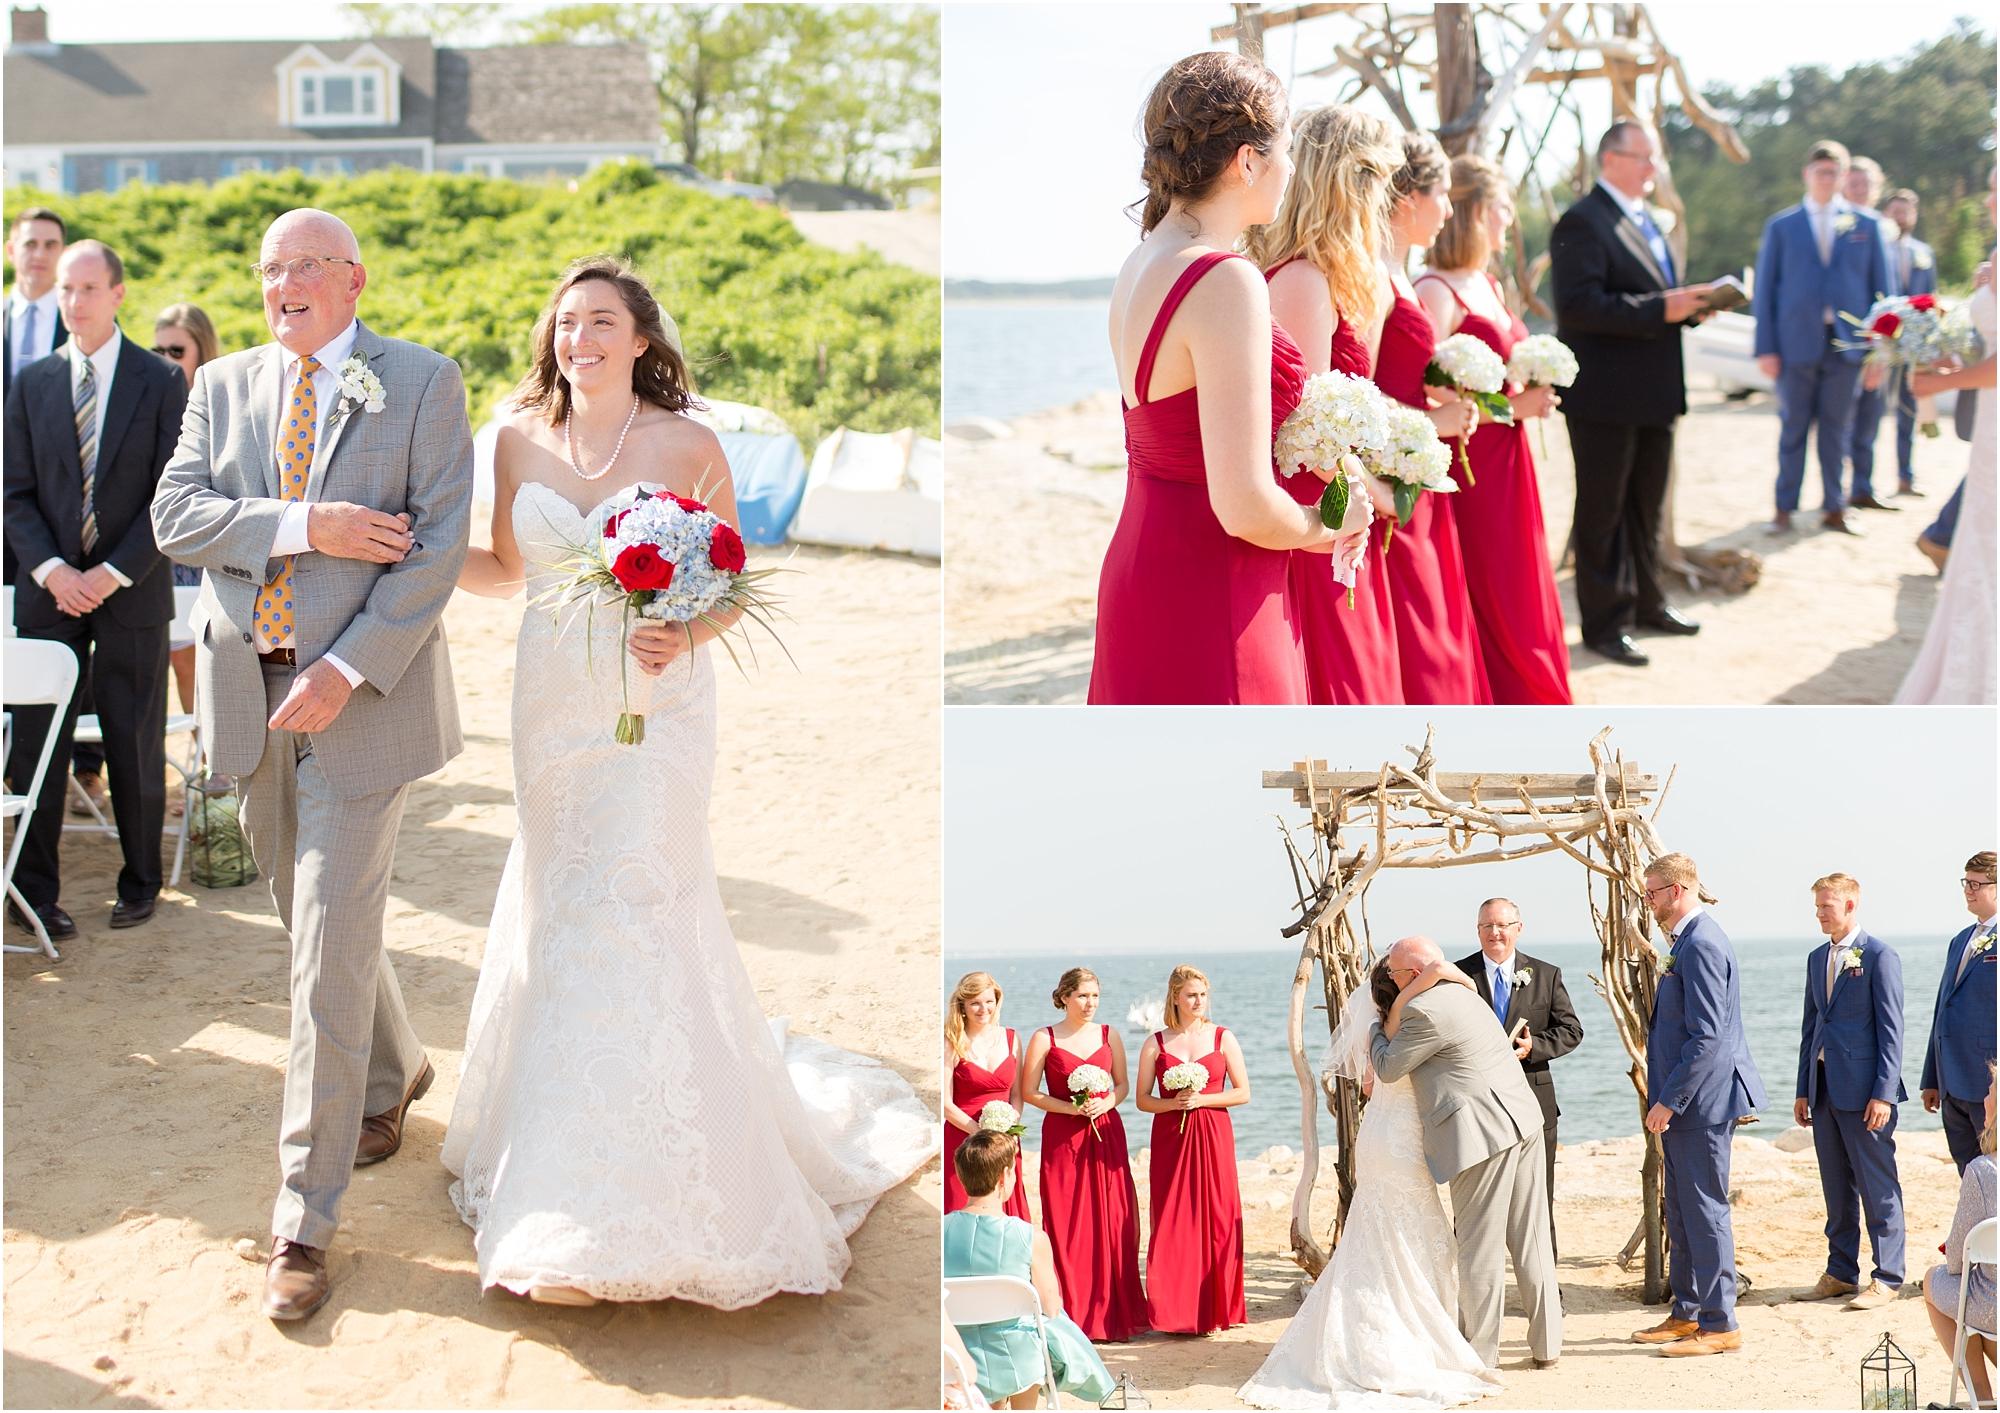 Goodman 5-Ceremony-636_anna grace photography wellfleet cape cod massachusetts destination wedding photographer Chequessett Yacht and Country Club wedding photo.jpg